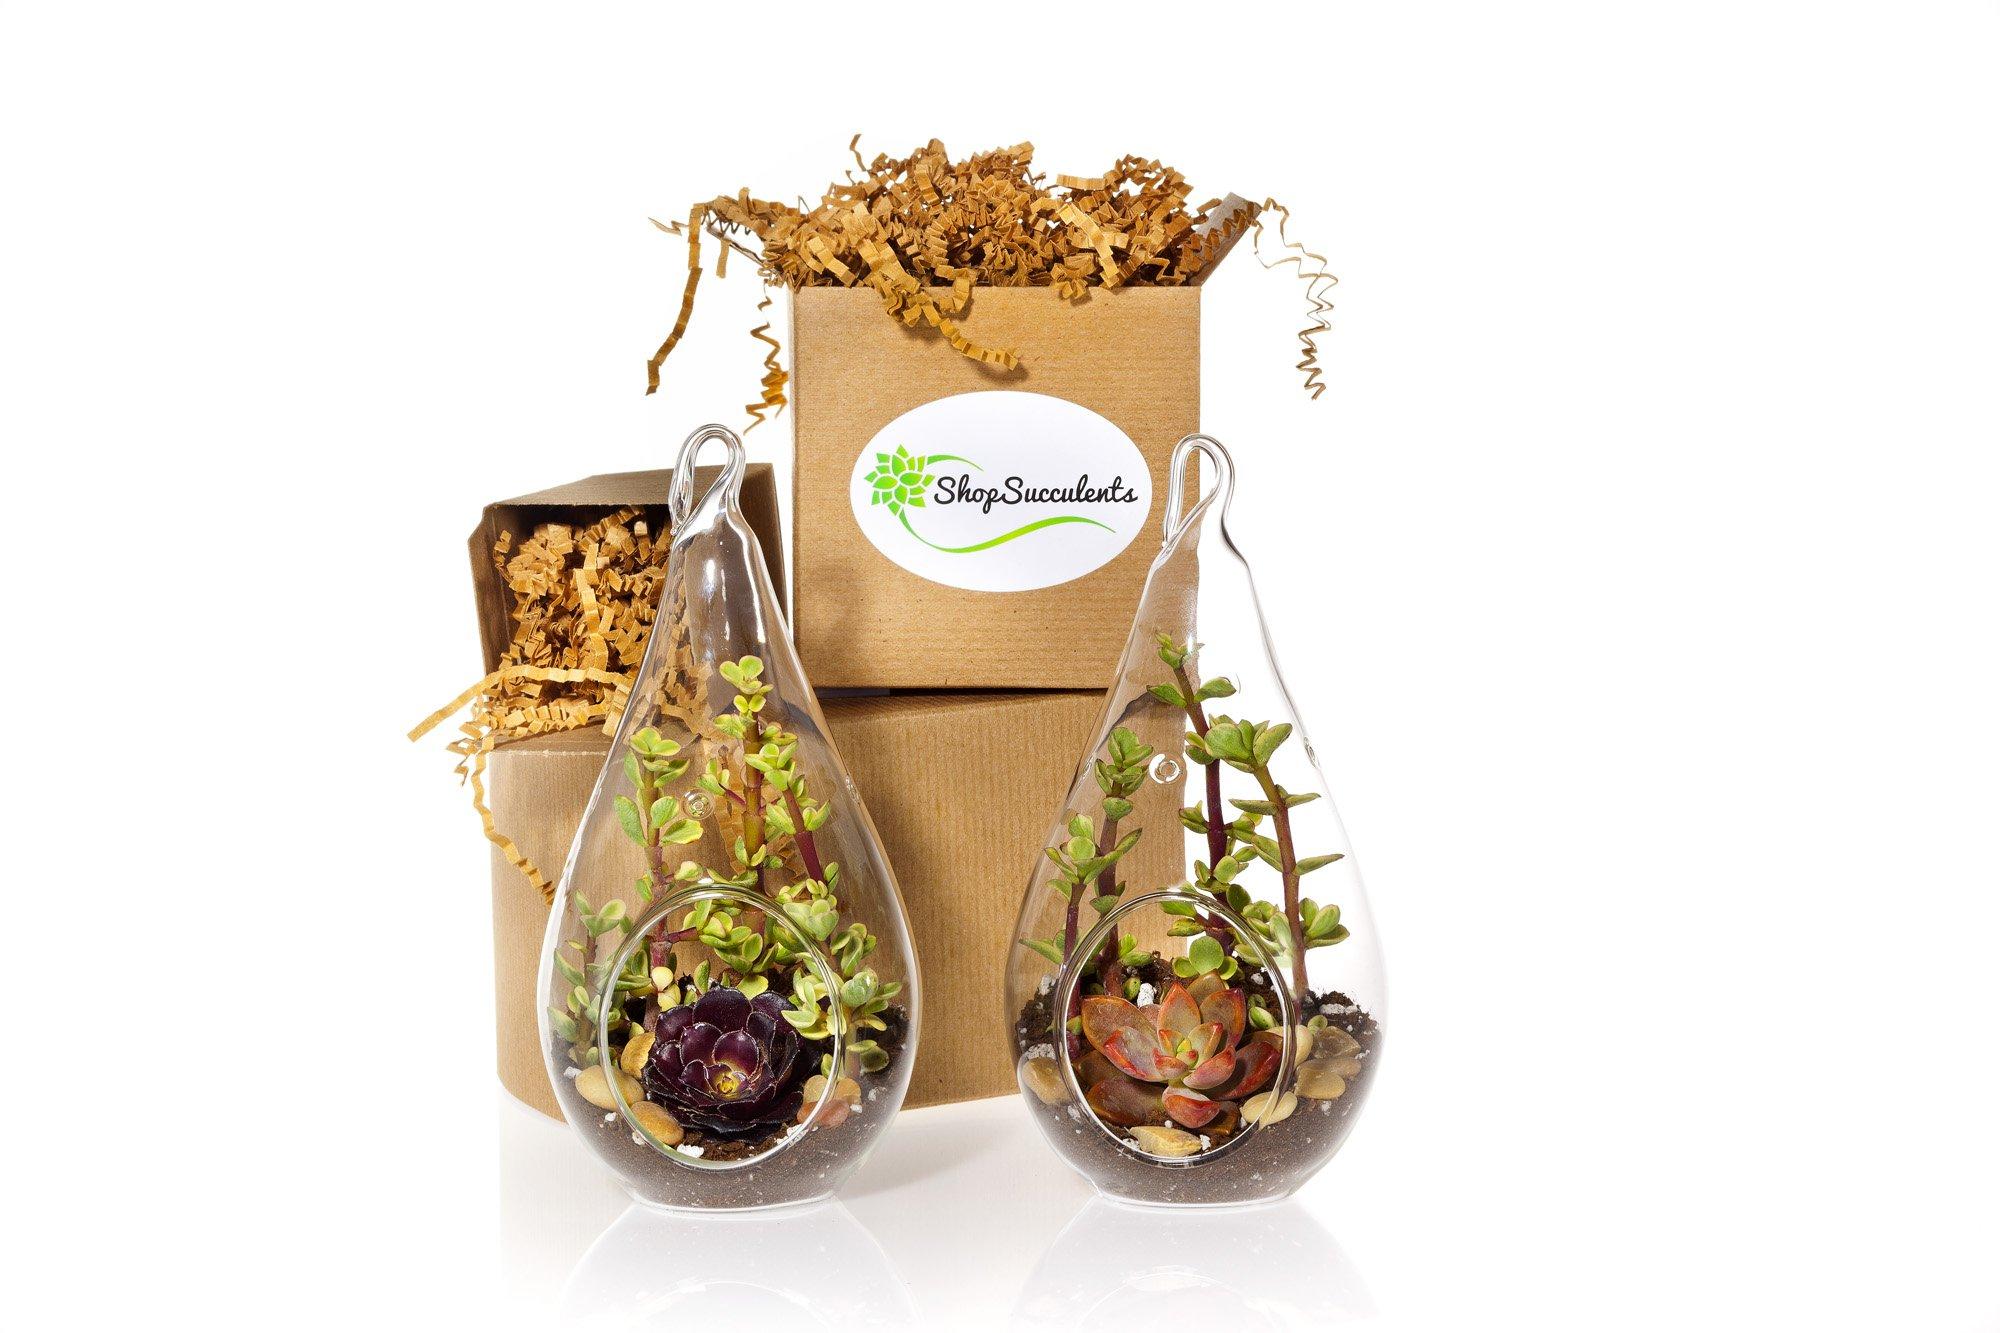 Shop Succulents | Teardrop Terrarium Collection of Live Succulent Plants, Hand Selected Variety | Collection of 2 by Shop Succulents